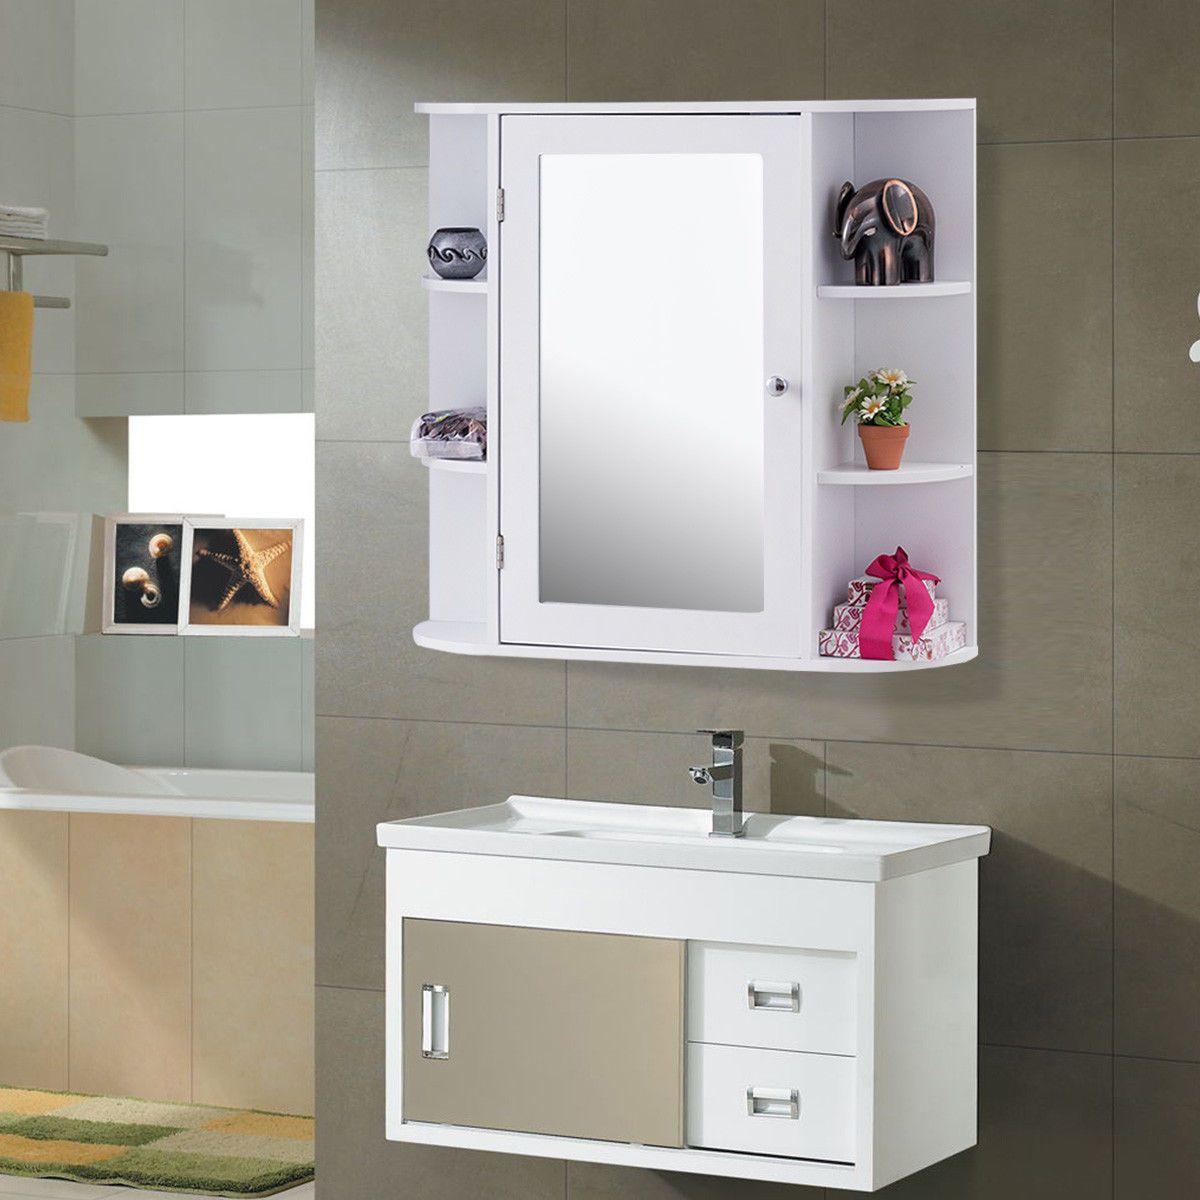 Icon2 Luxury Designer Fixures Giantex Multipurpose Mount Wall Surface Bathroom Stora Bathroom Storage Cabinet Bathroom Storage Bathroom Mirror Storage [ 1200 x 1200 Pixel ]